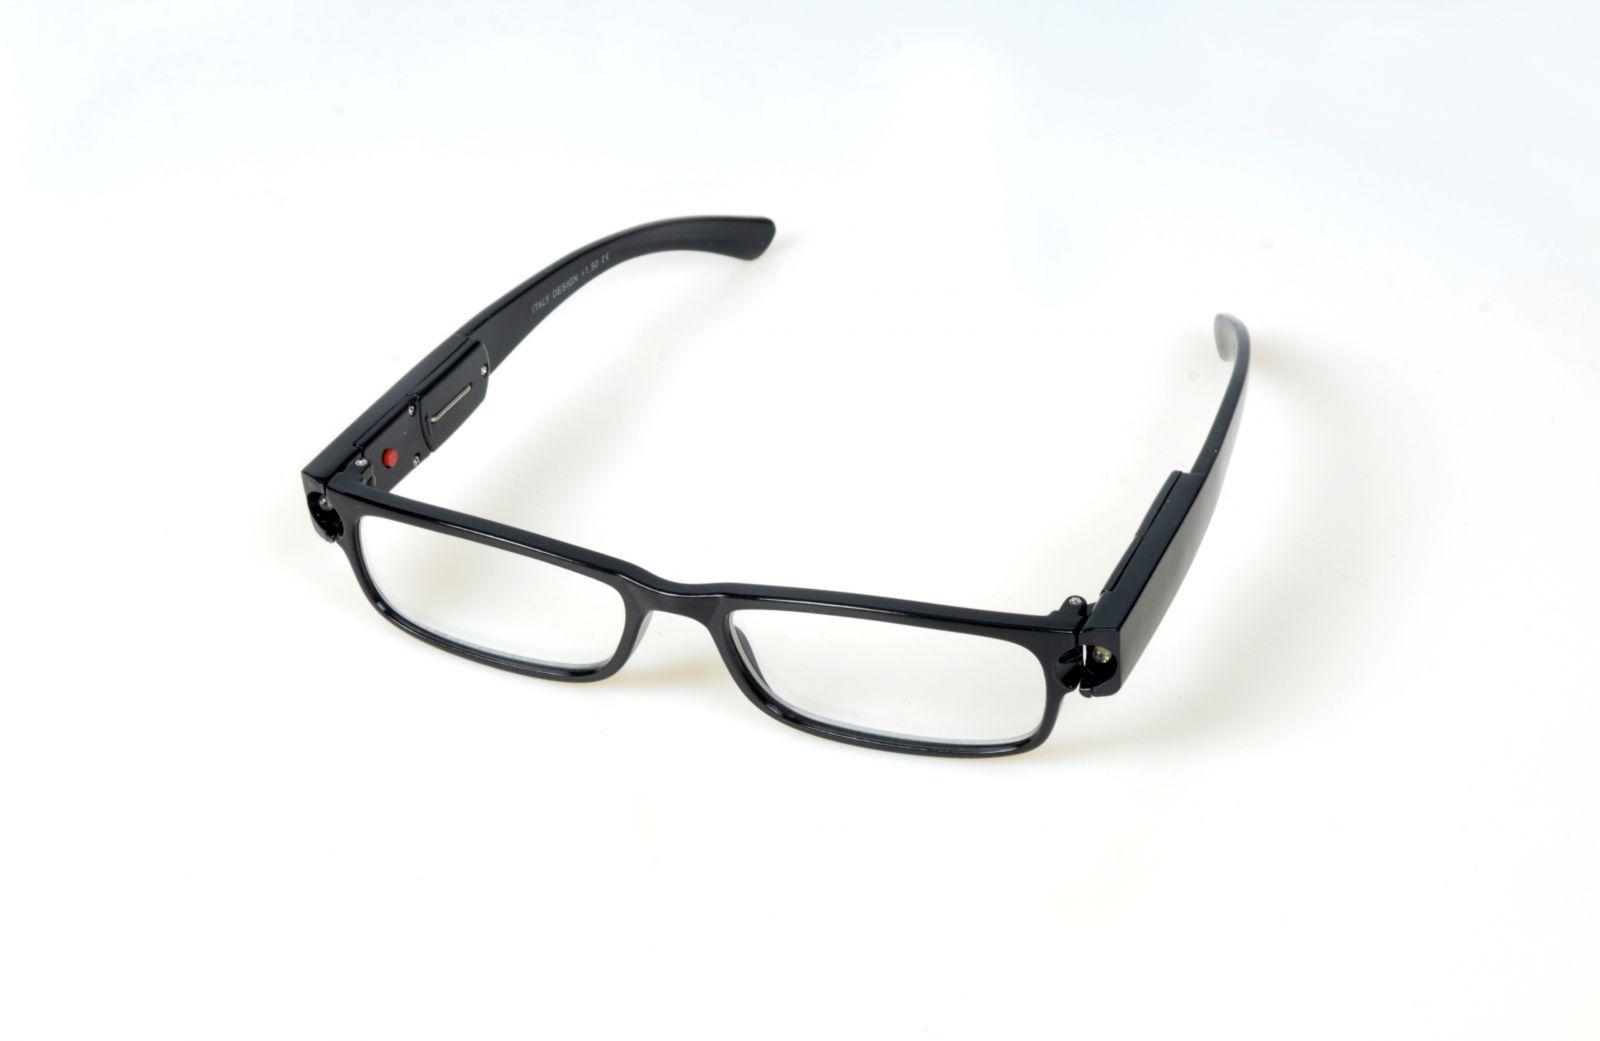 Dioptrické brýle se světýlkama +2,50